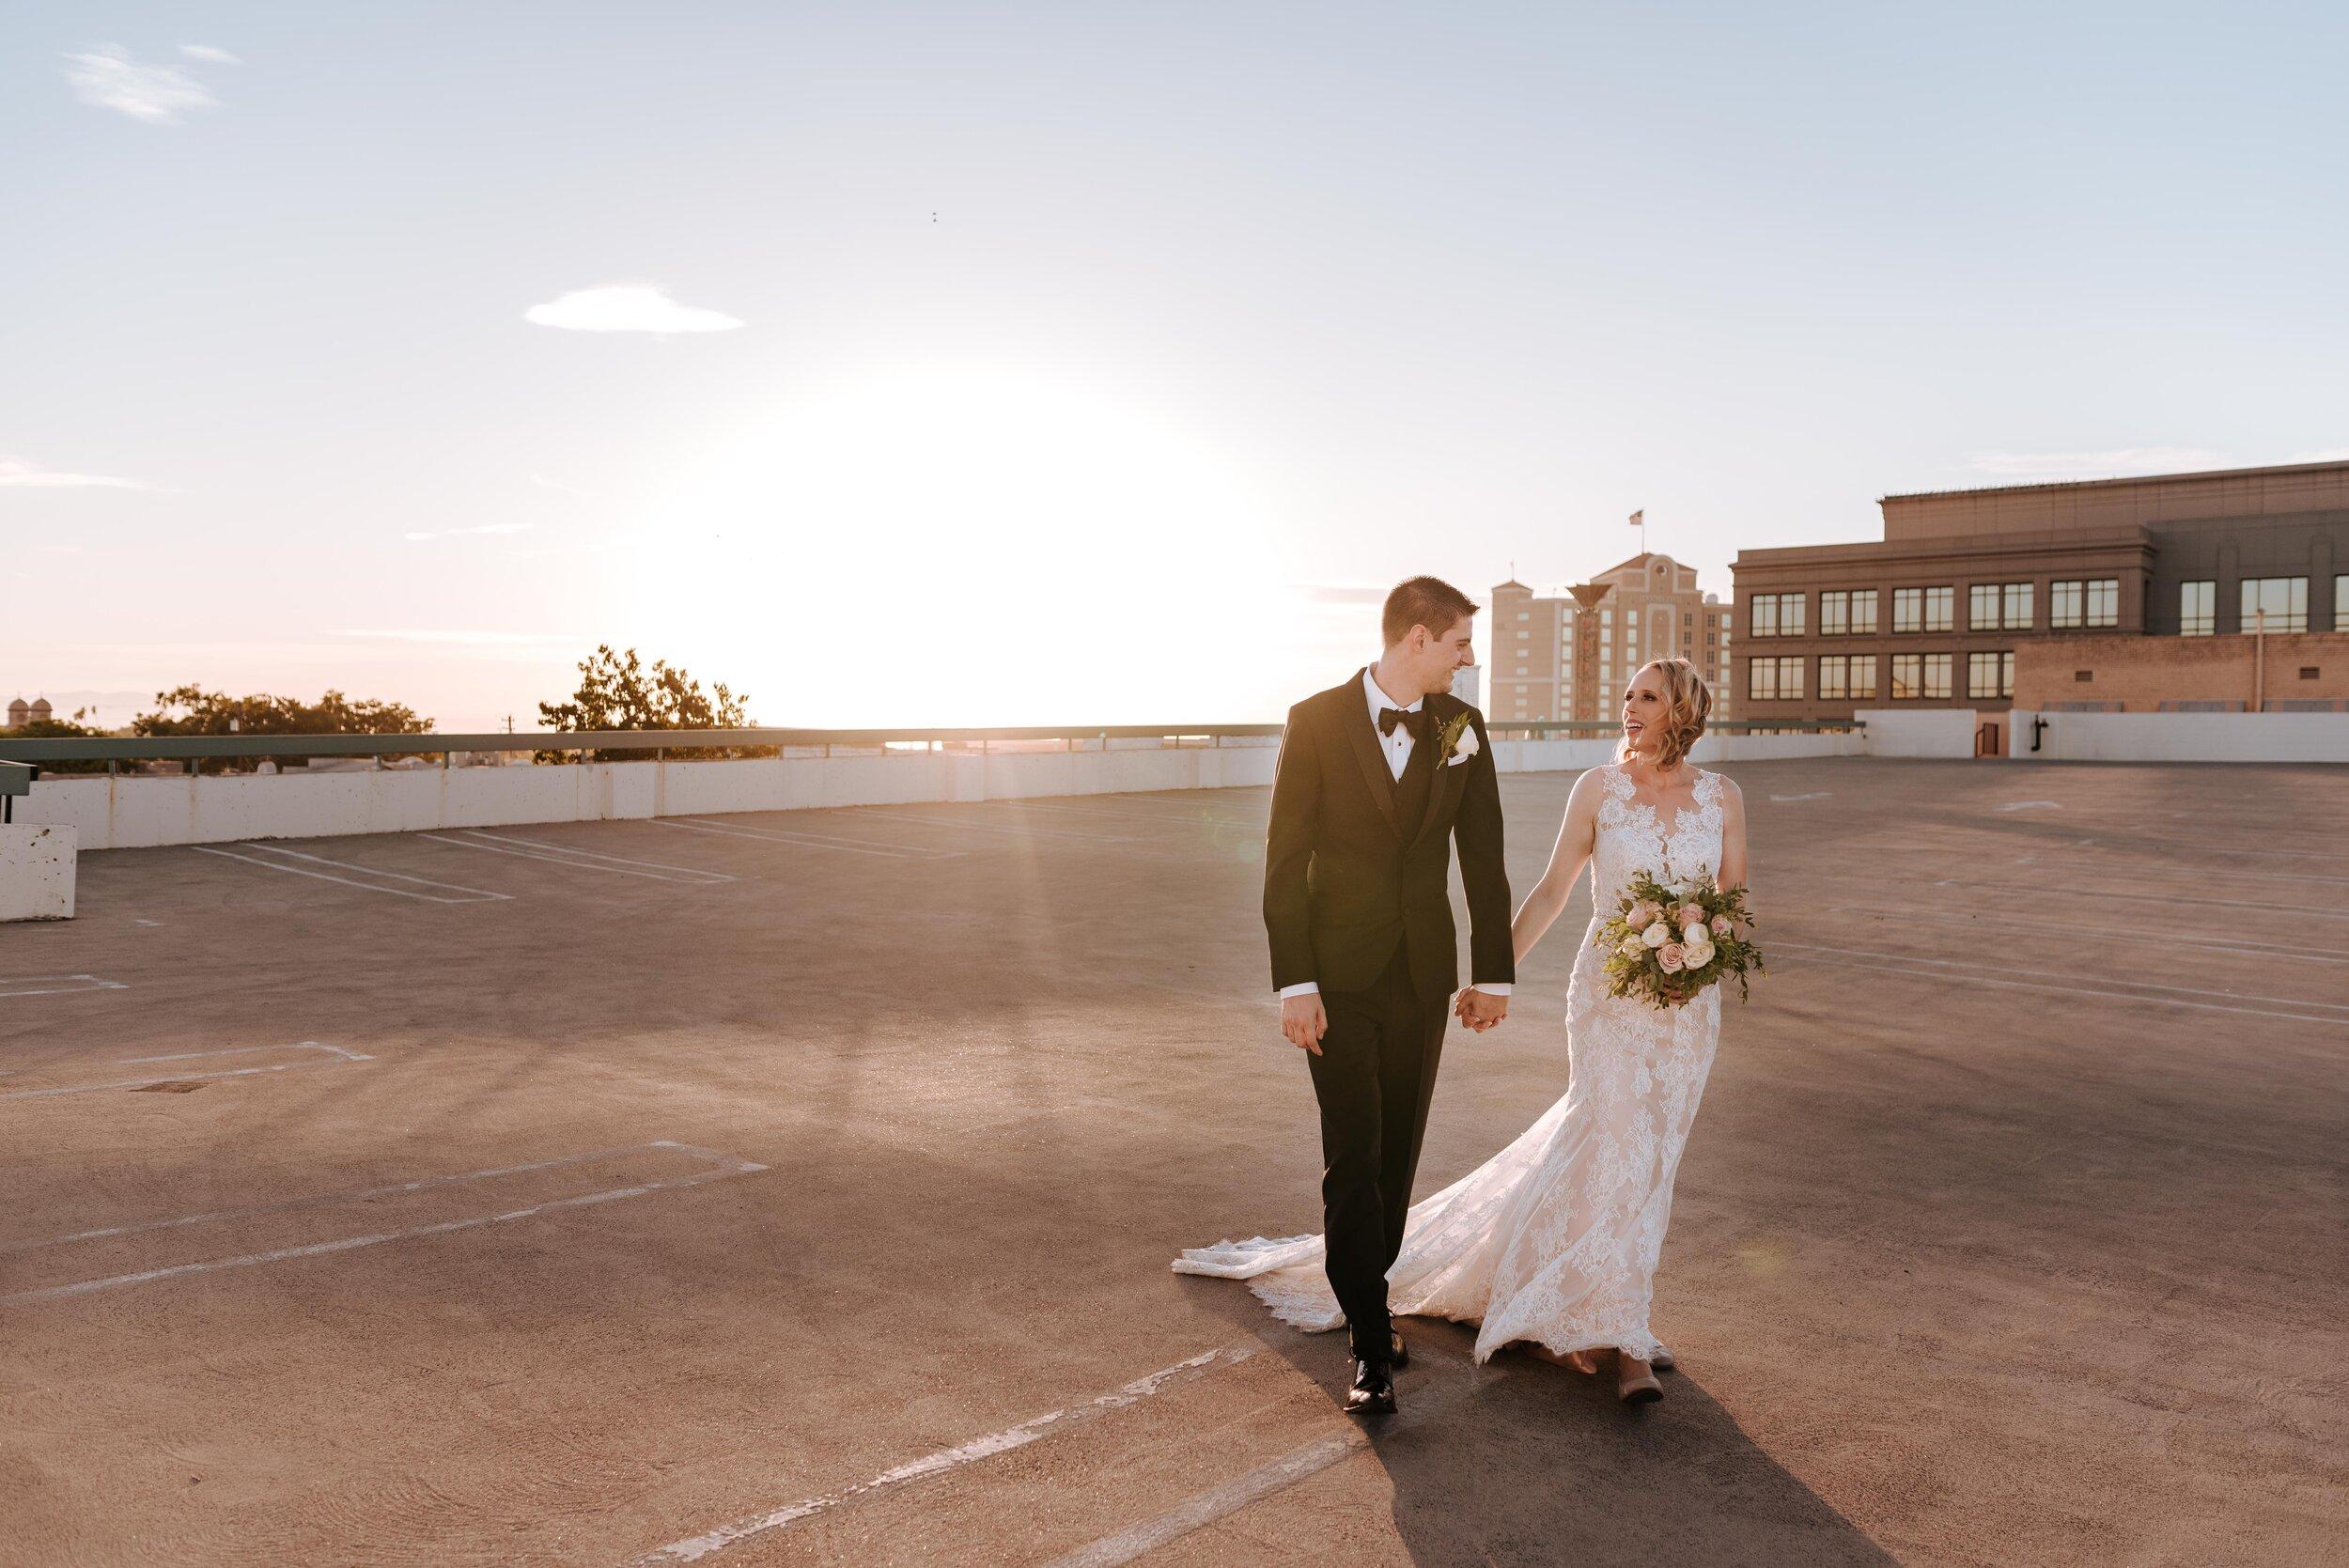 rooftop_wedding-1.JPG